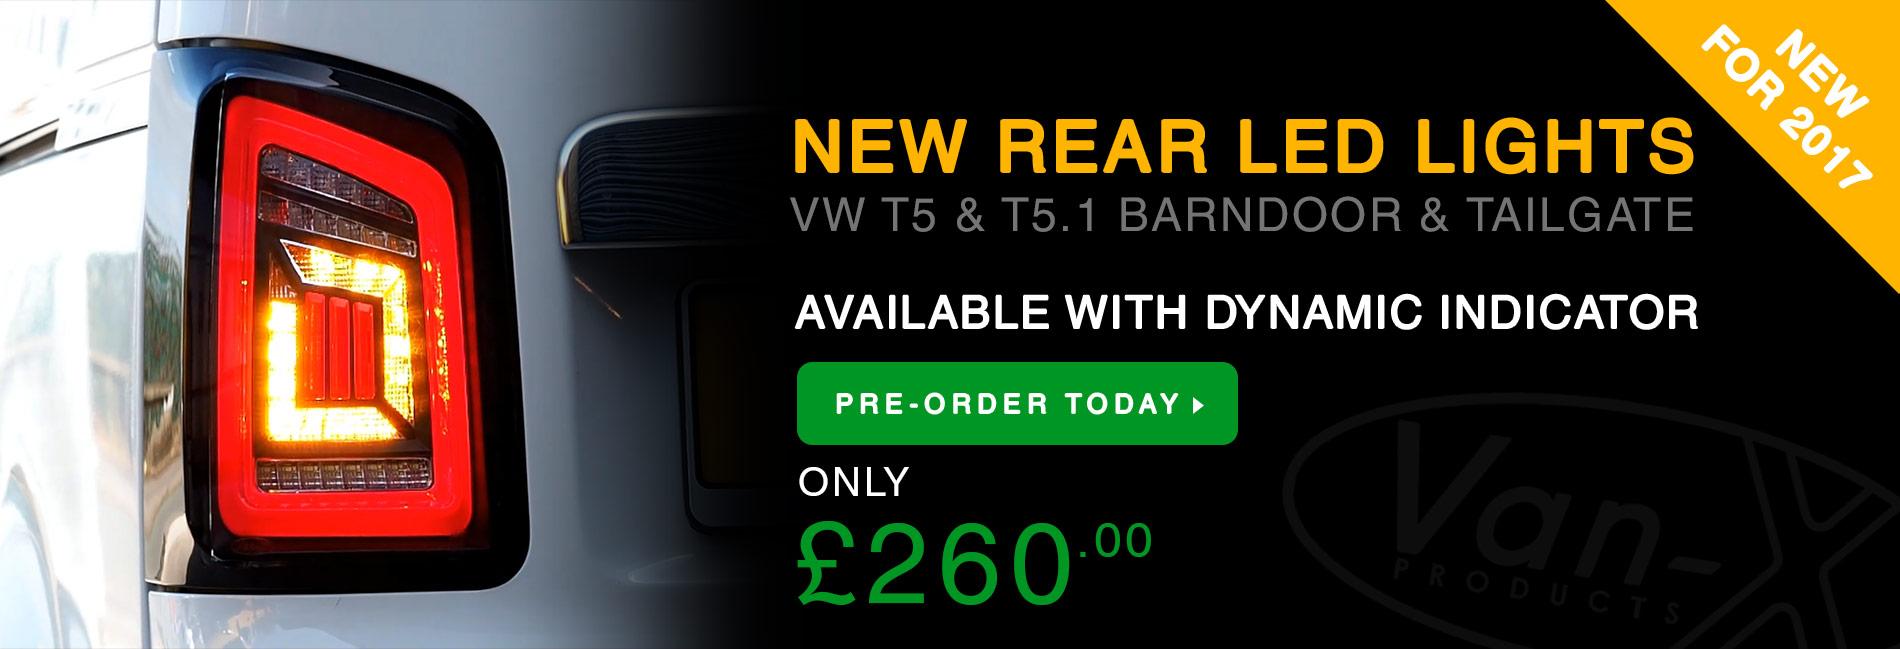 BRAND NEW: VW T5 & T5.1 DYNAMIC REAR LED LIGHTS